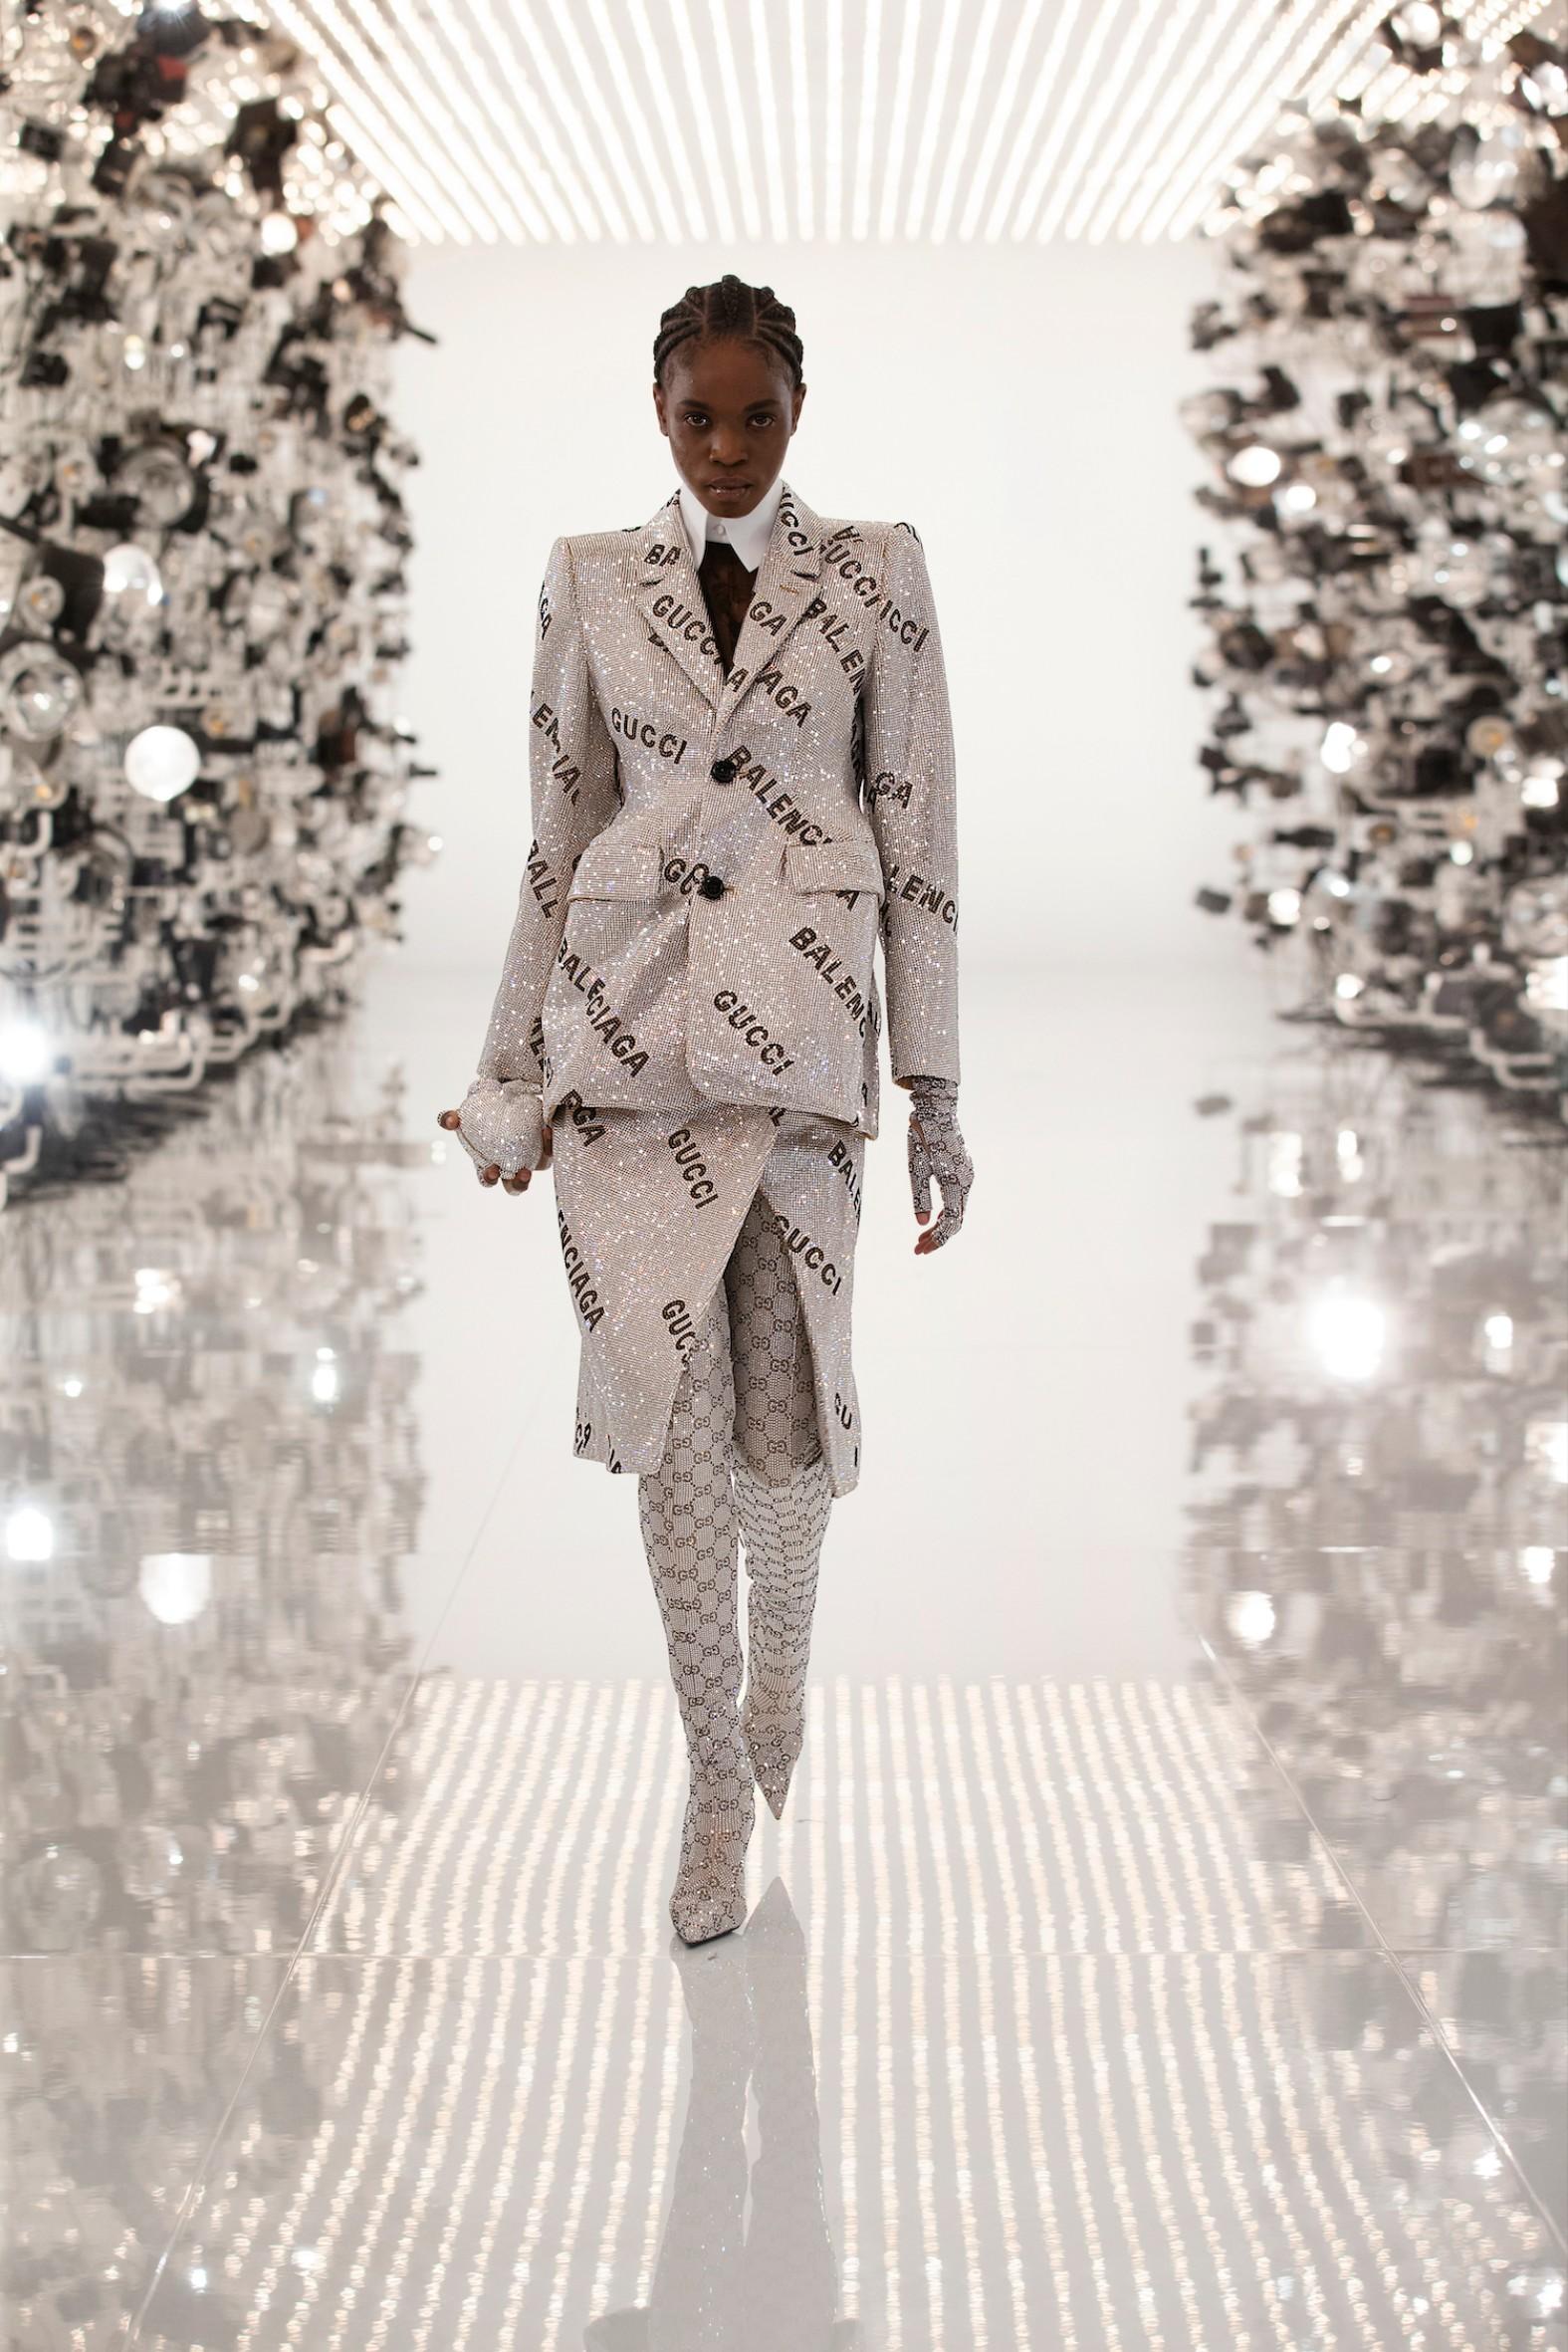 A model walking the runway of Gucci's Aria show wearing a Gucci x Balenciaga collaboration look